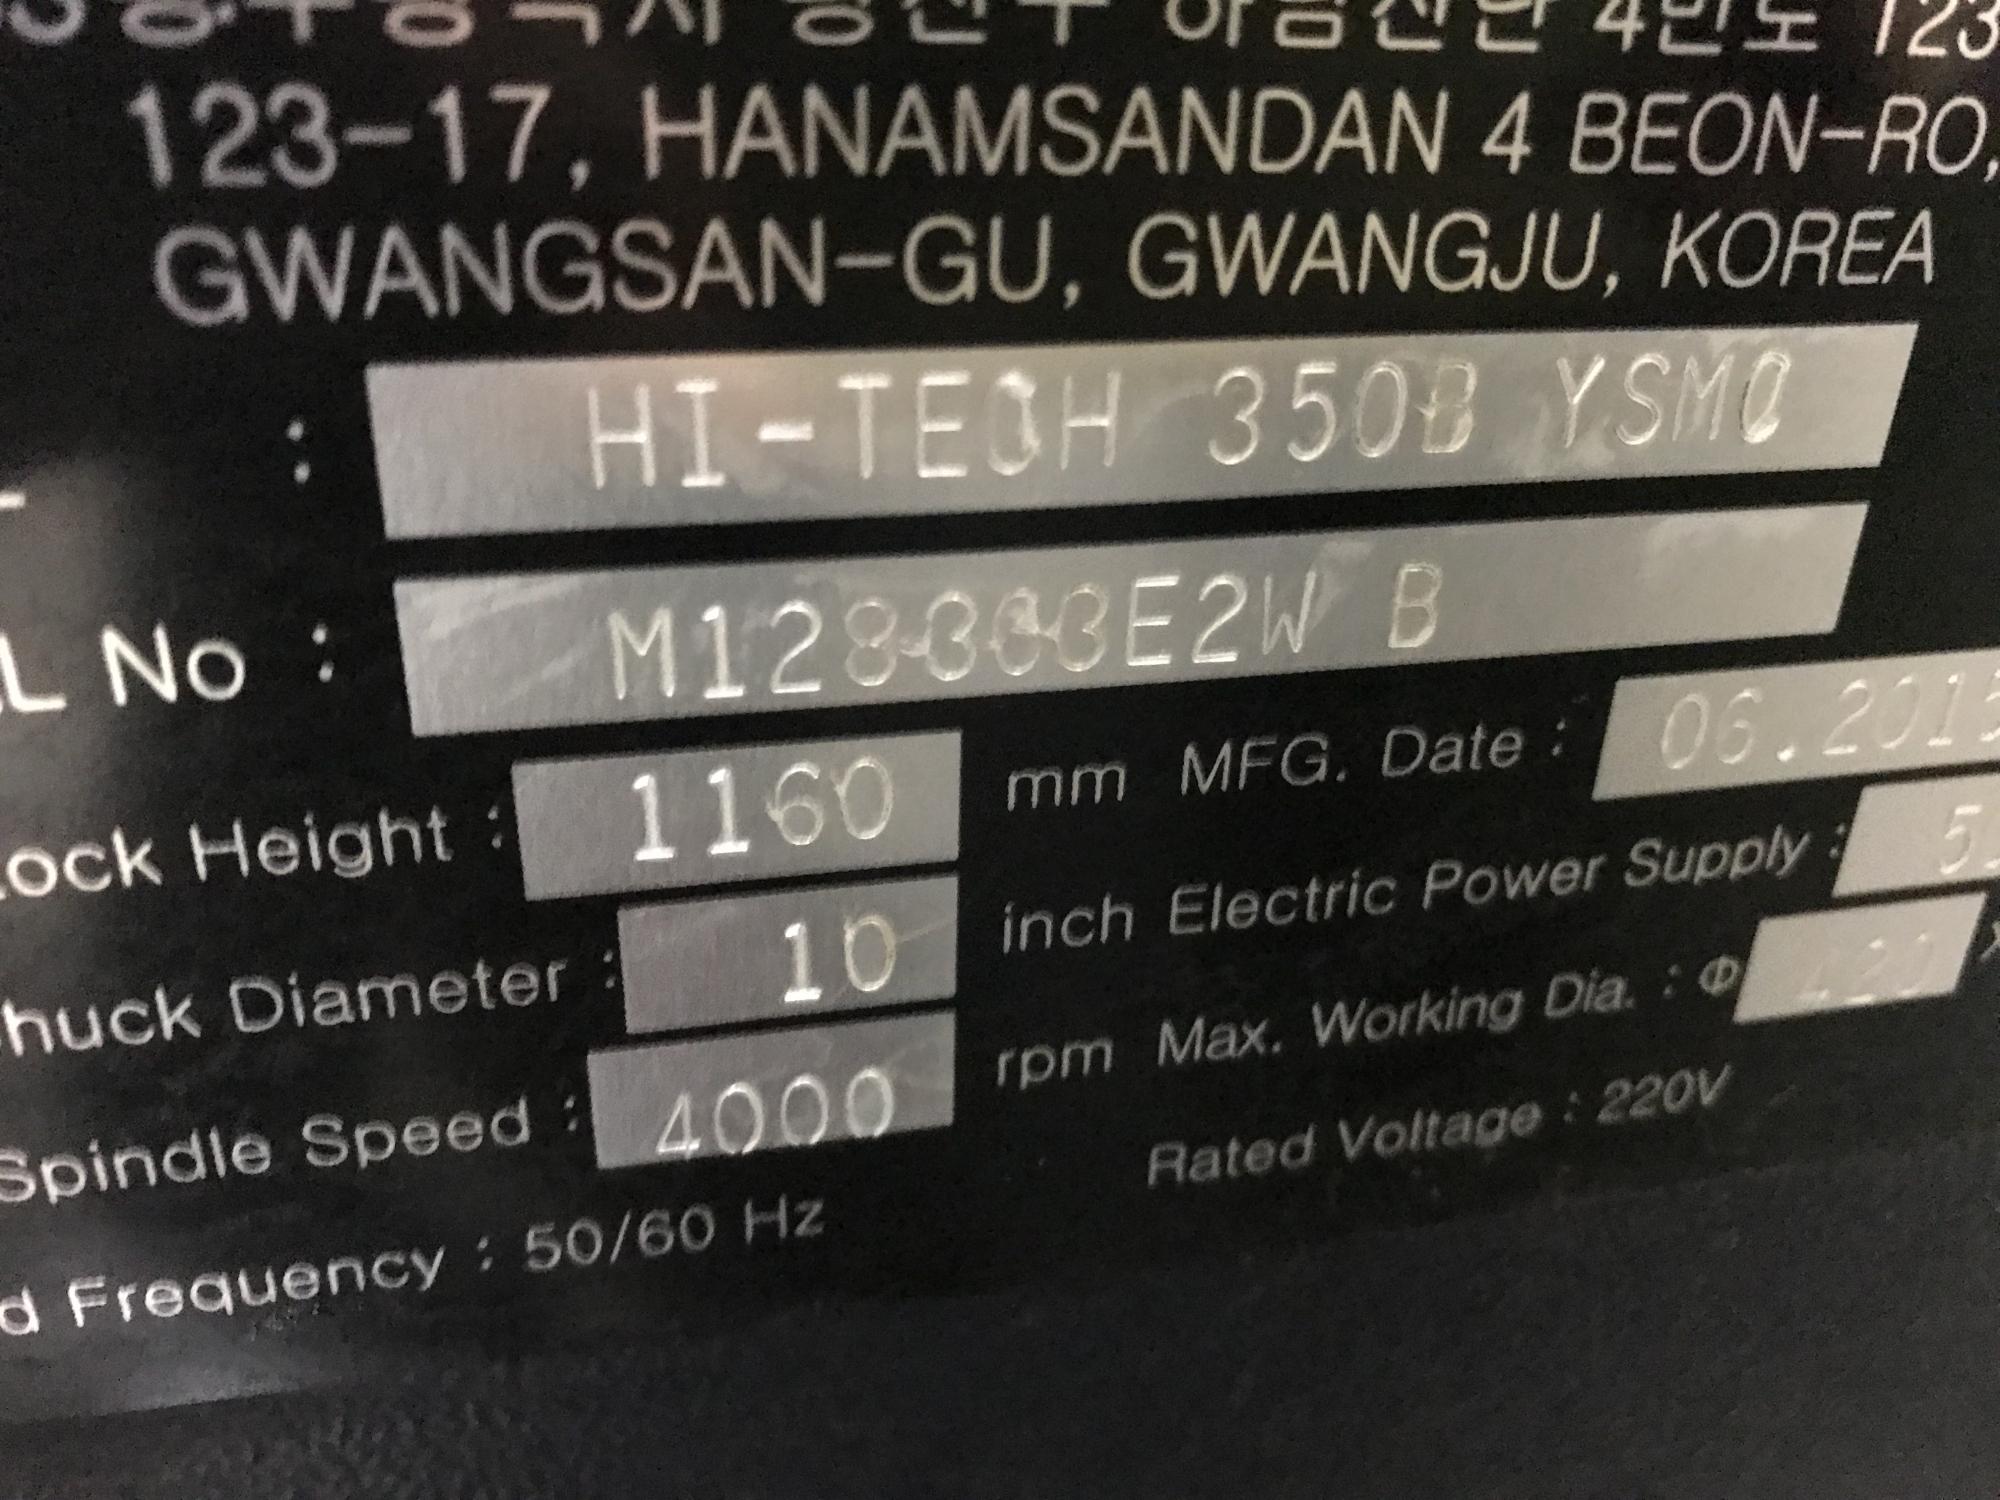 2015 HWACHEON Hi-Tech 350BYSMC